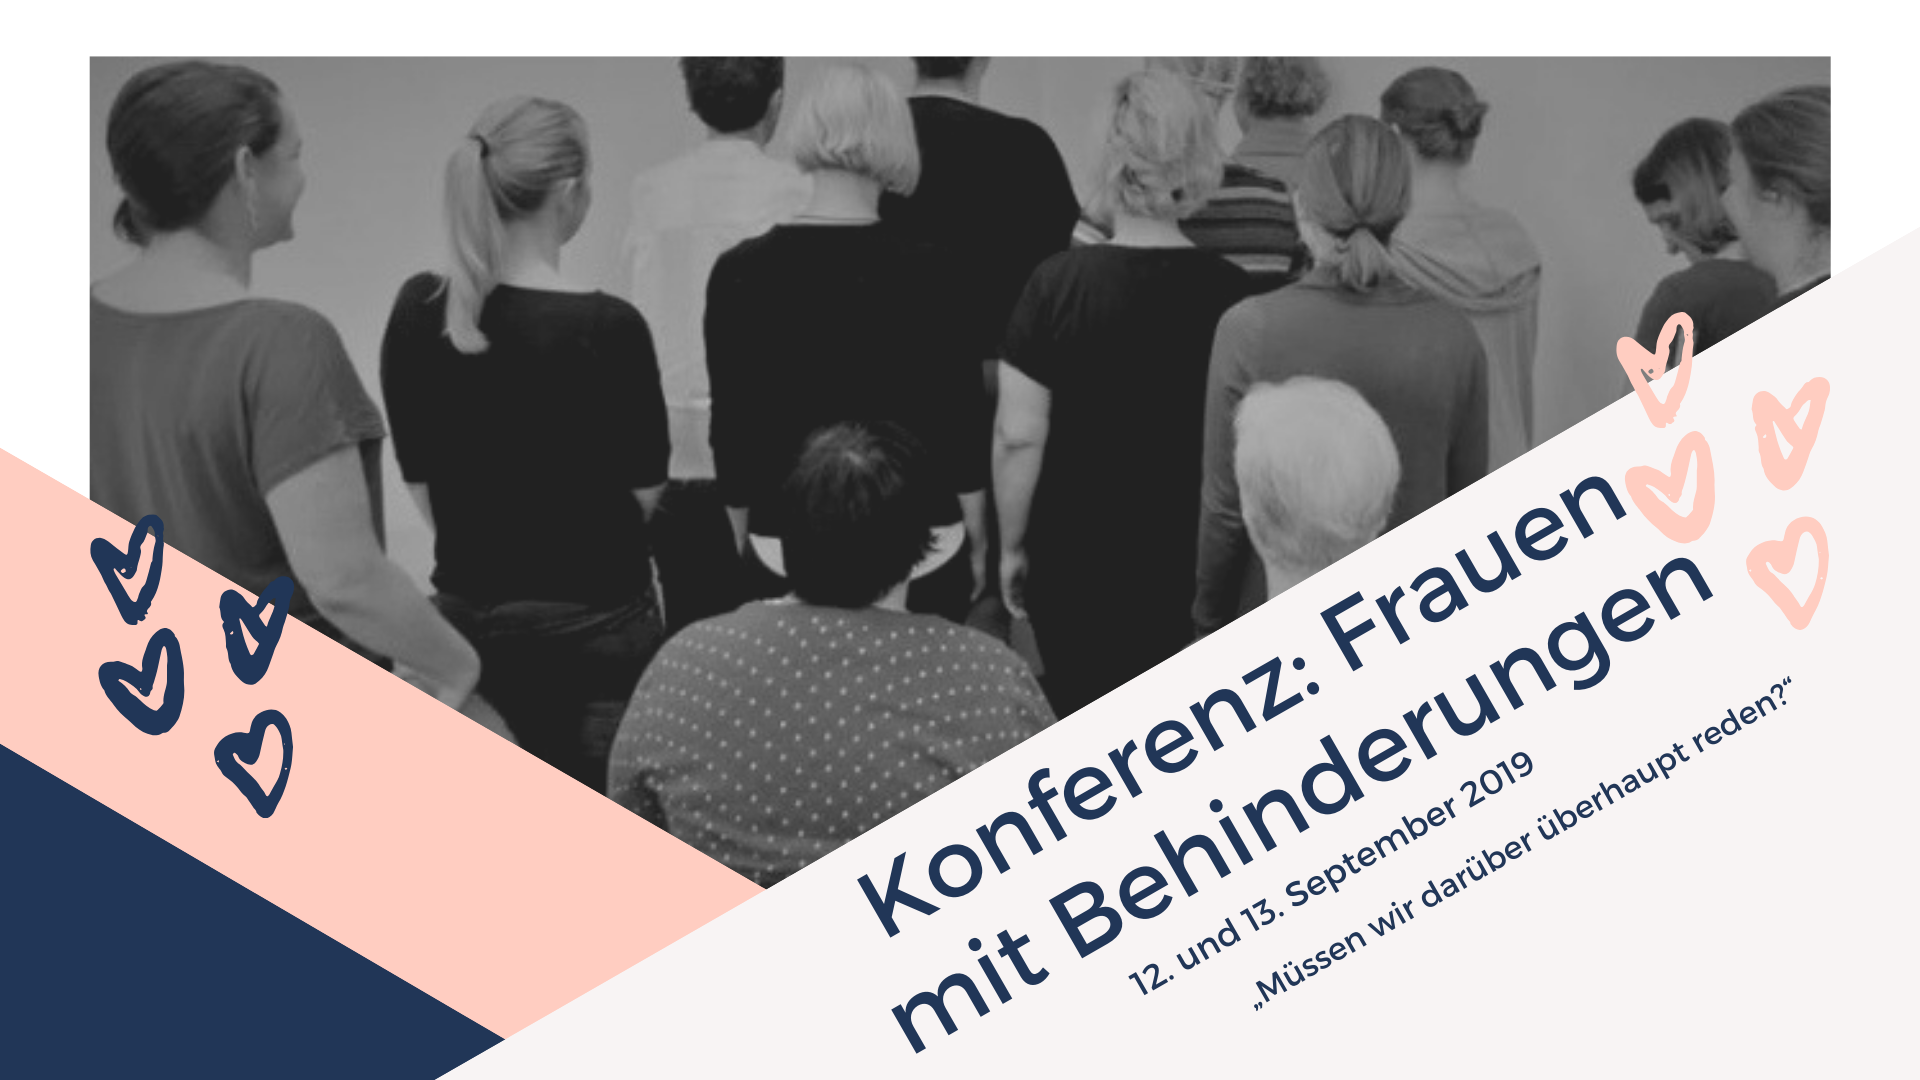 Konferenz: Frau12. und 13. September 2019, ÖGB Zentrale Catamaran Johann-Böhm-Platz 1, 1020 Wien